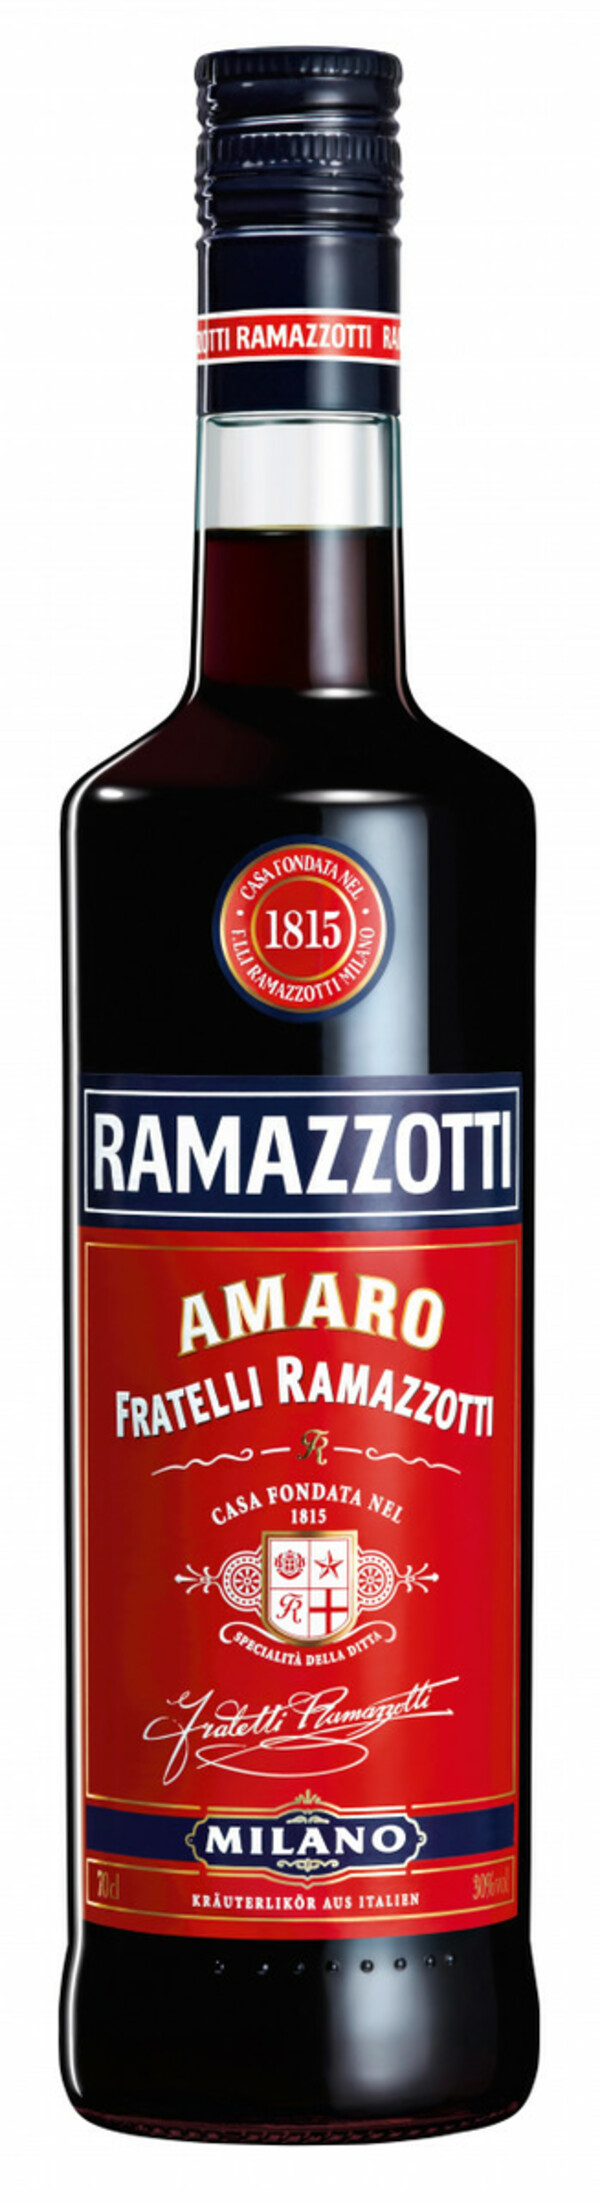 Ramazotti Amaro